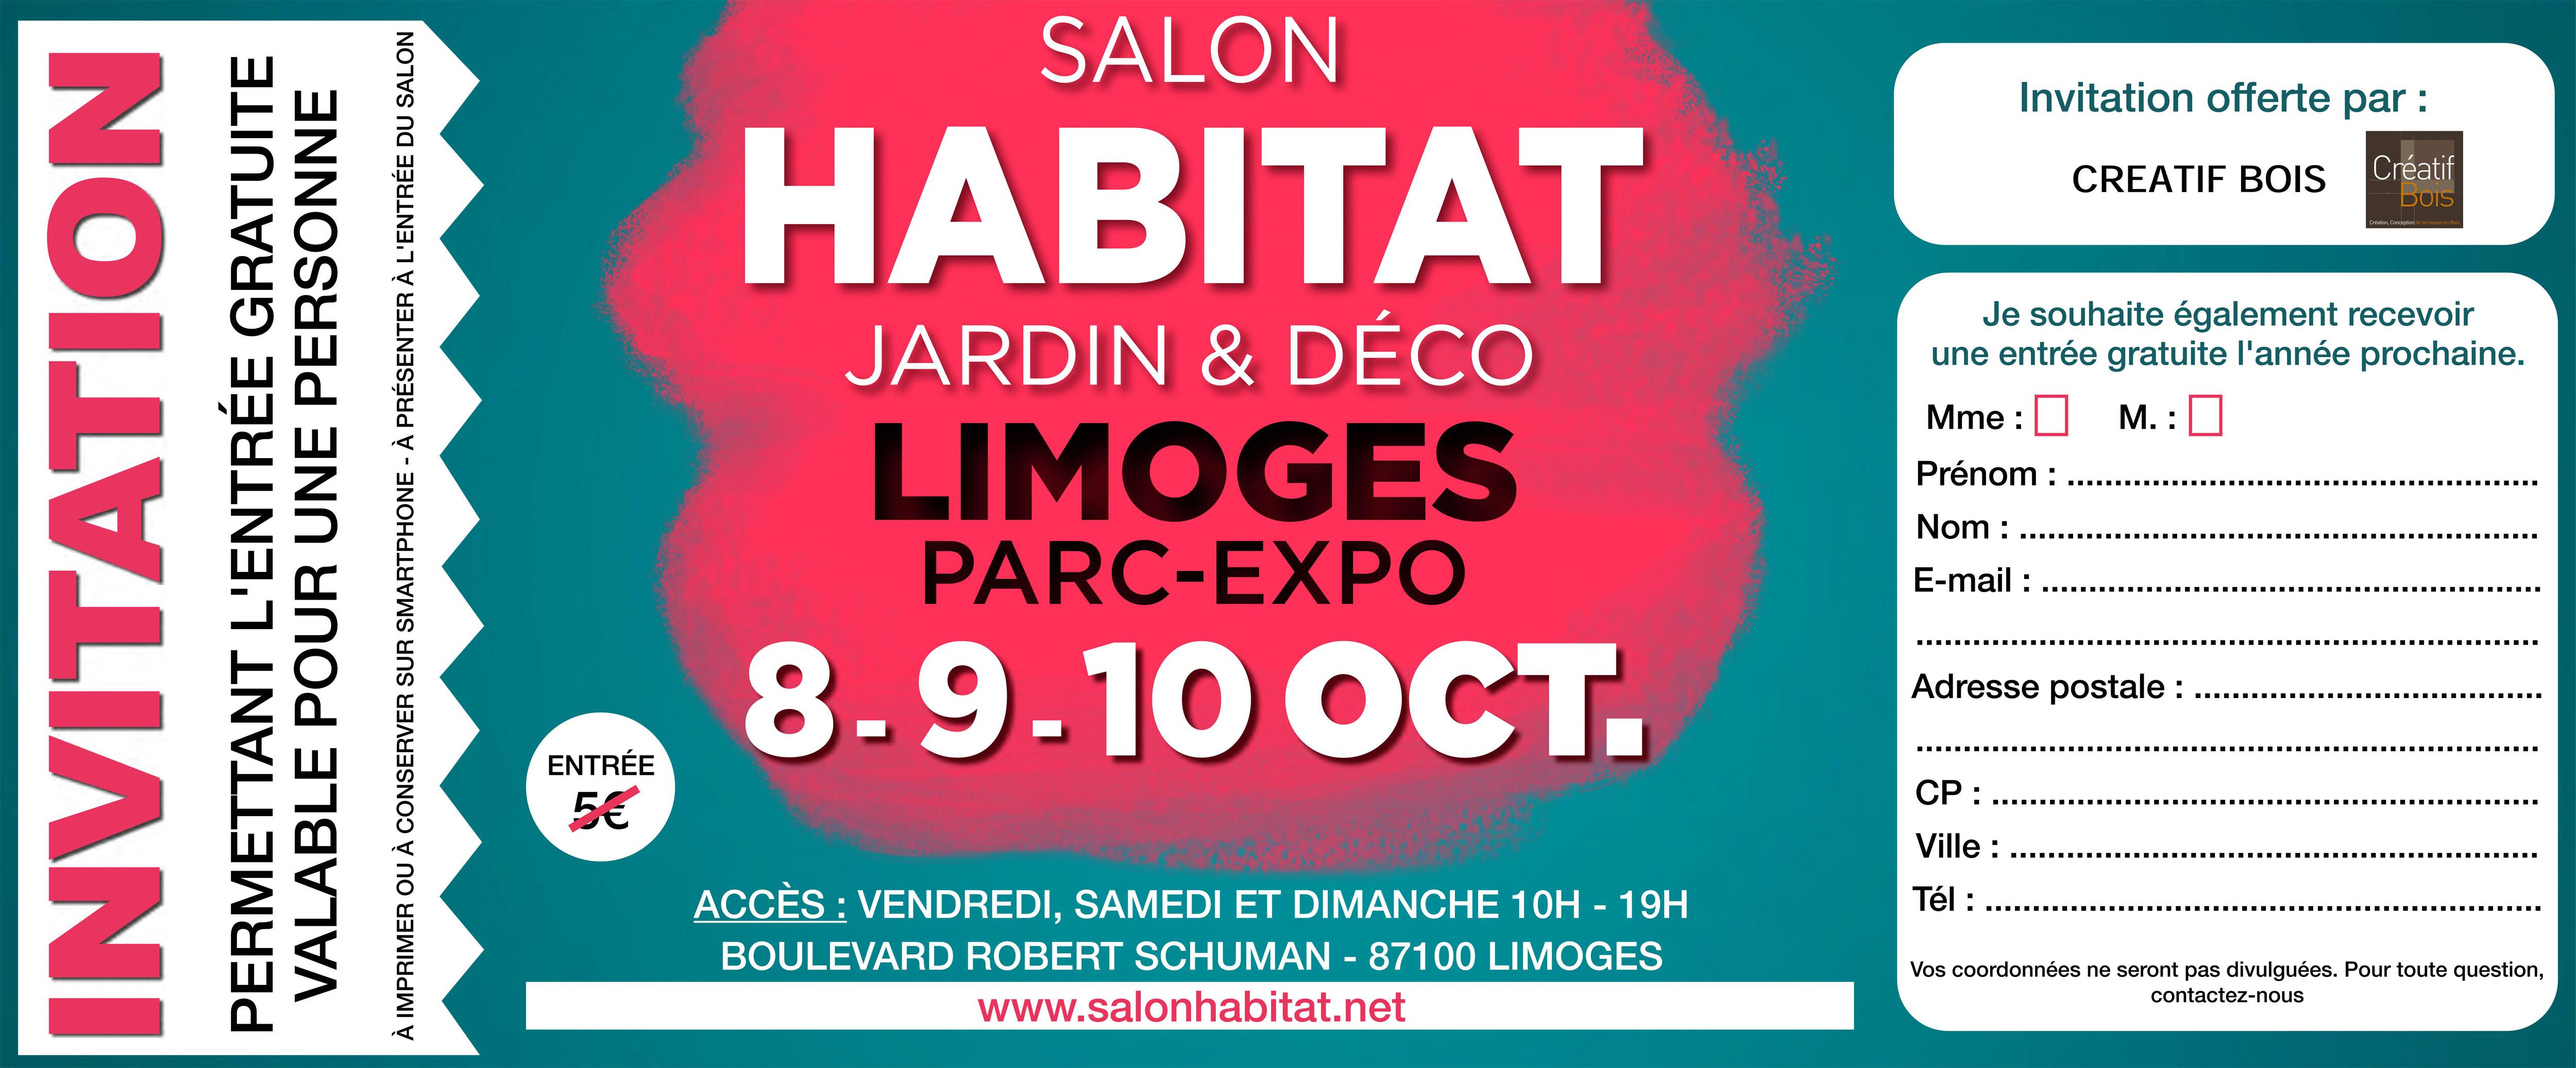 Tarif foire expo limoges 2013 for Amiens foire expo